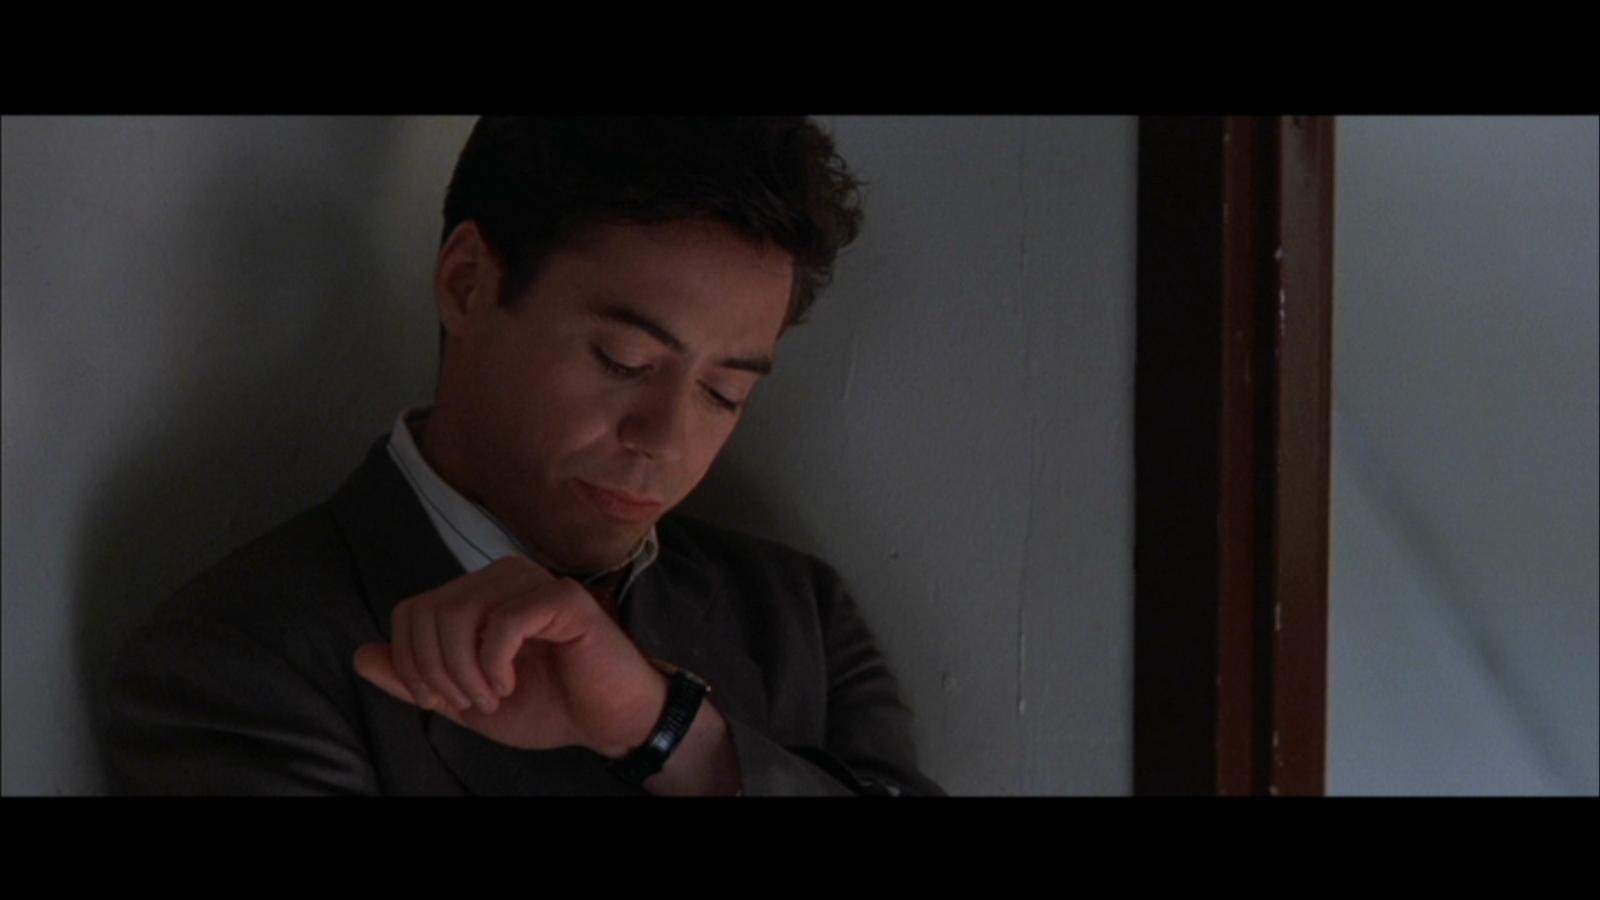 Robert in 'Heart and Souls'